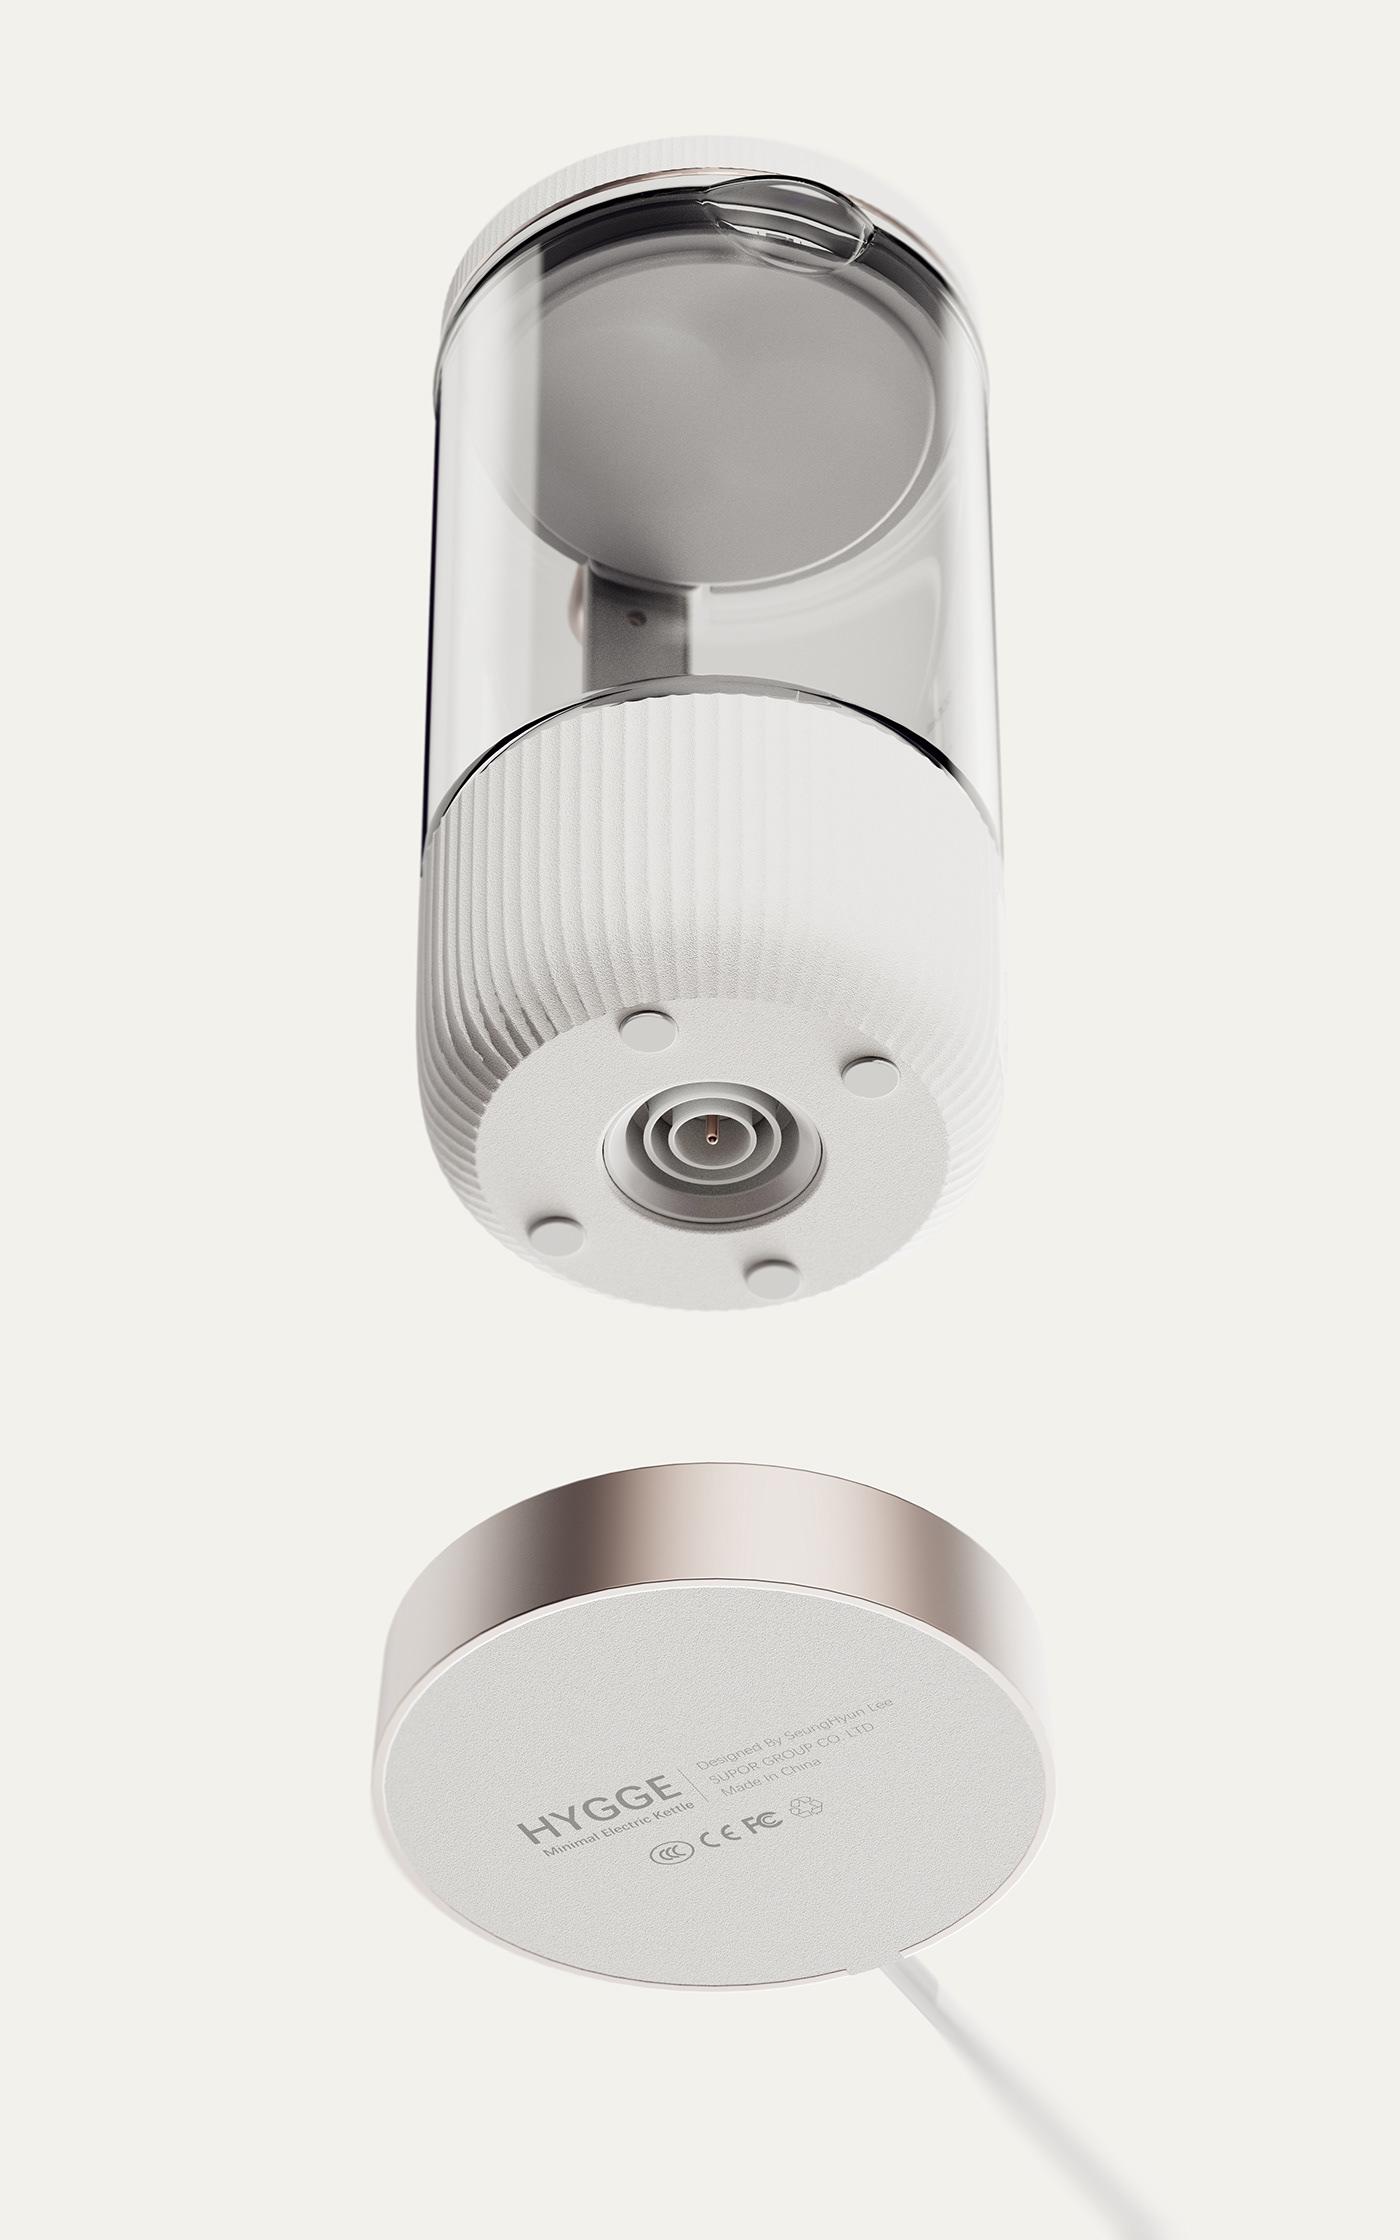 architecture industrial design  kettle kitchen product design  visualization